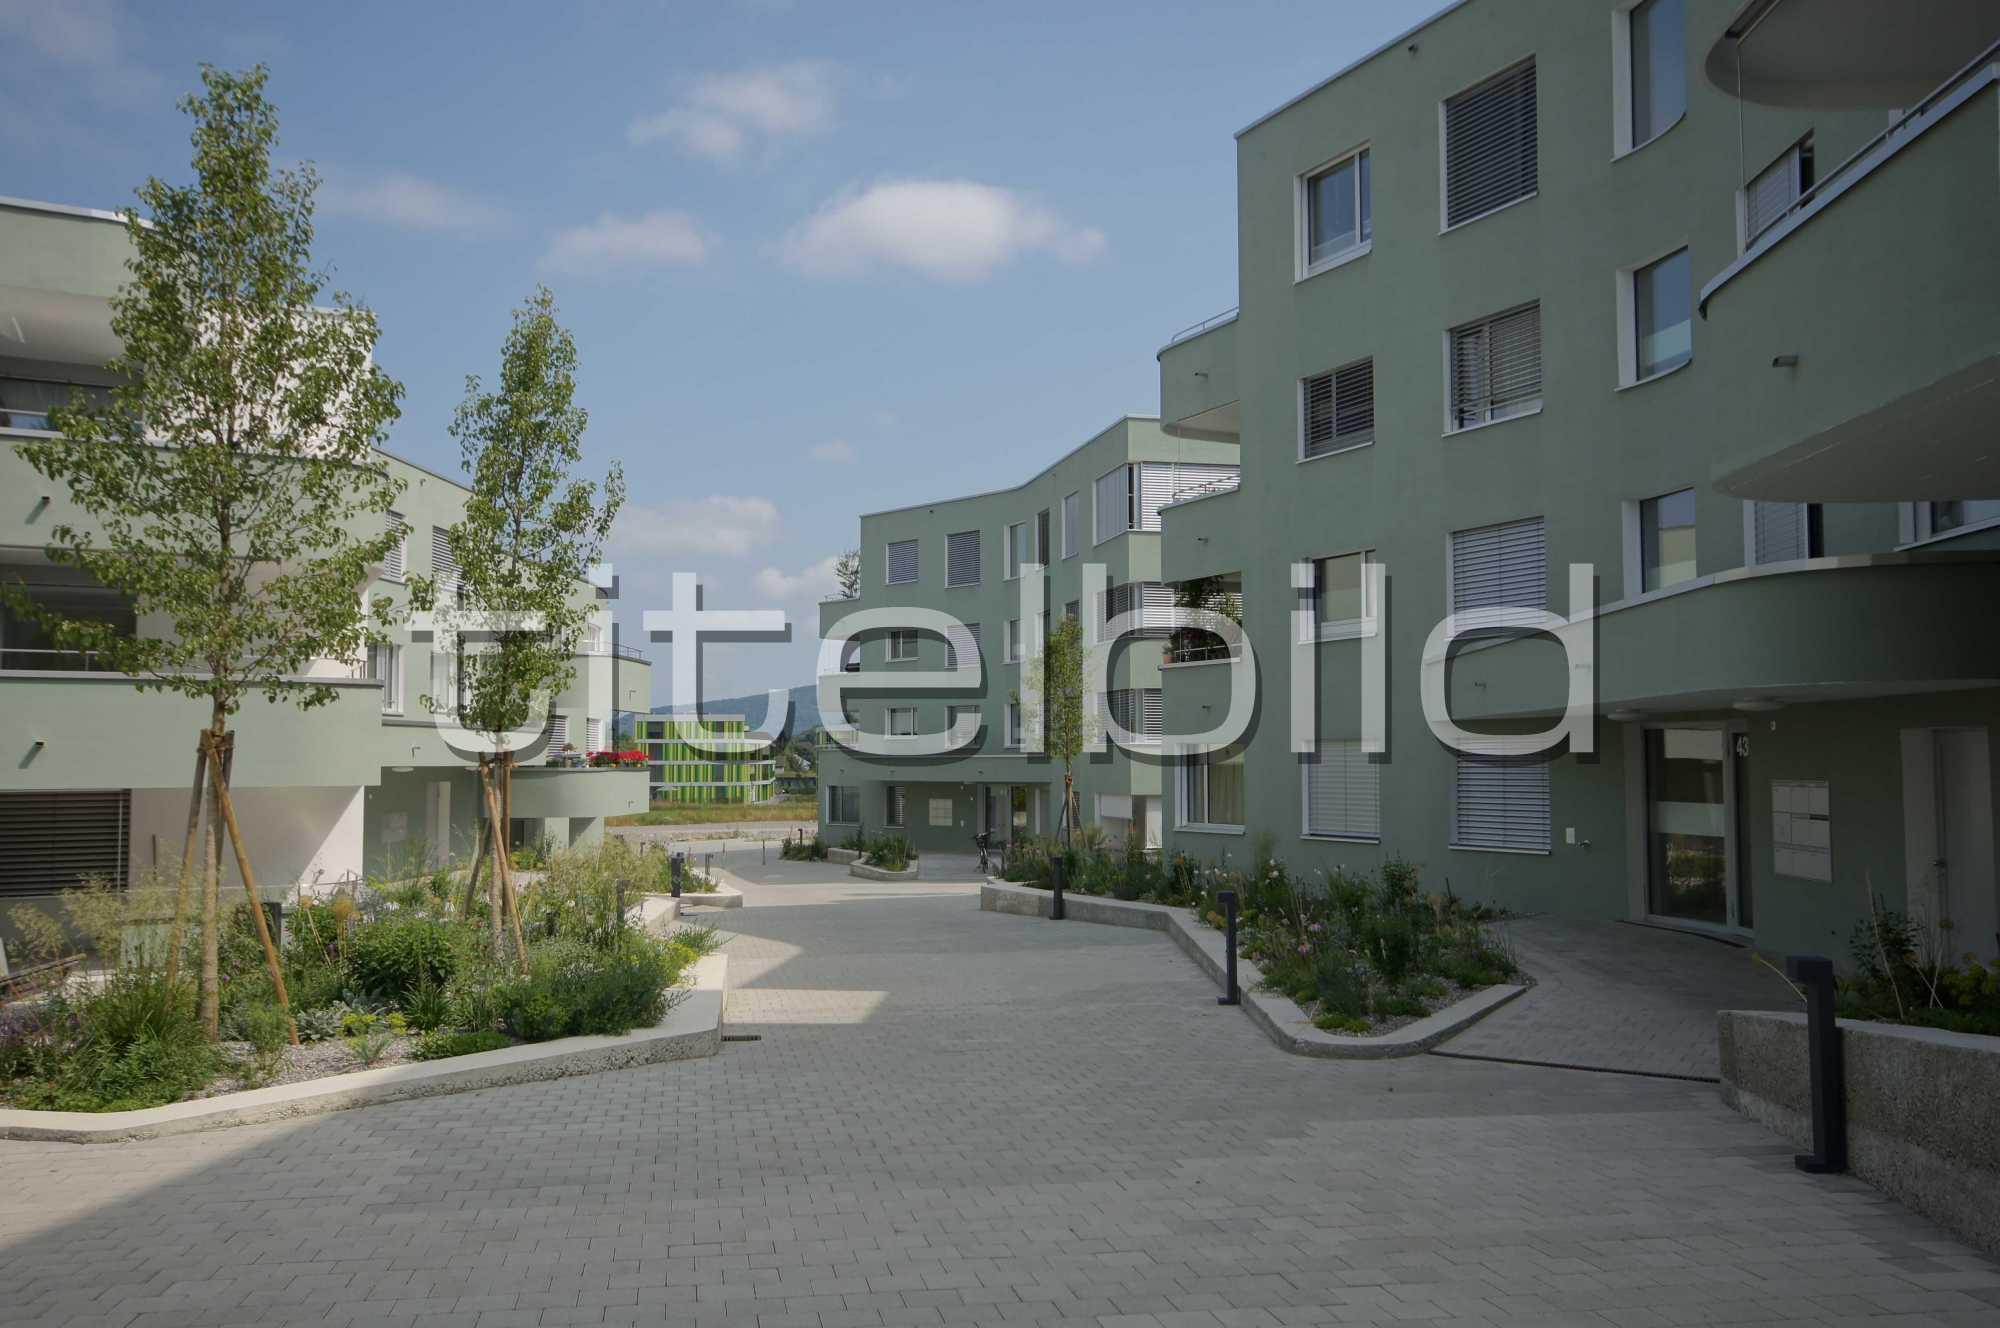 Projektbild-Nr. 5: Wohnüberbauung Widmi 3